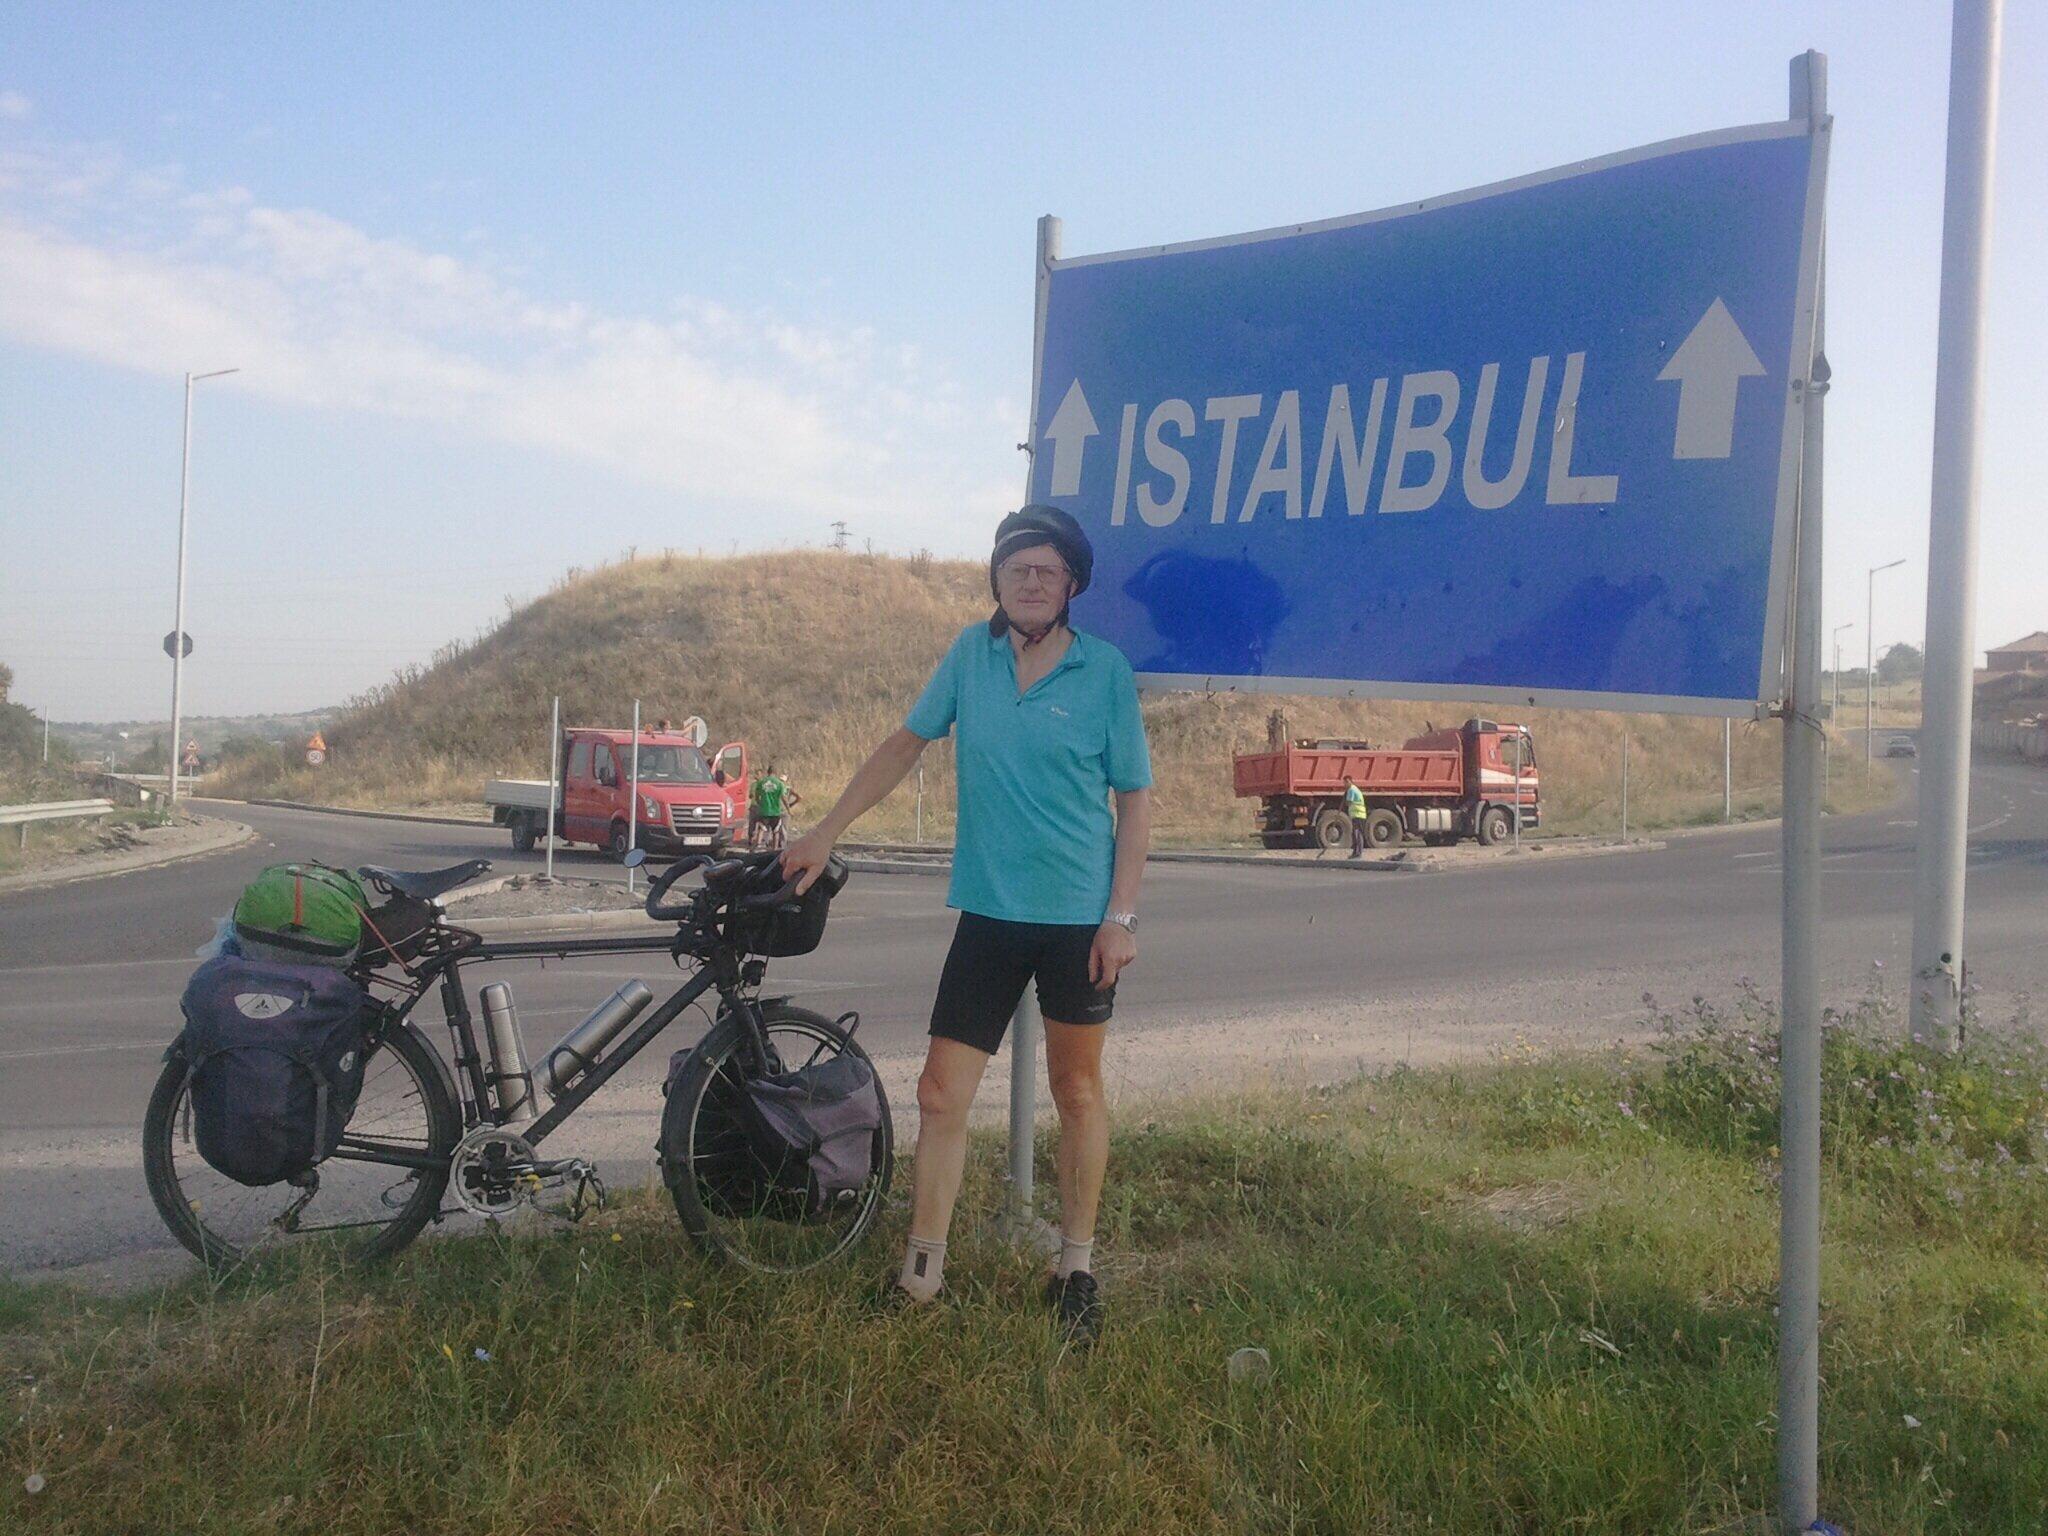 Vendredi 11 Juillet : Bezar (Bulgarie) - Edirne (Turquie)